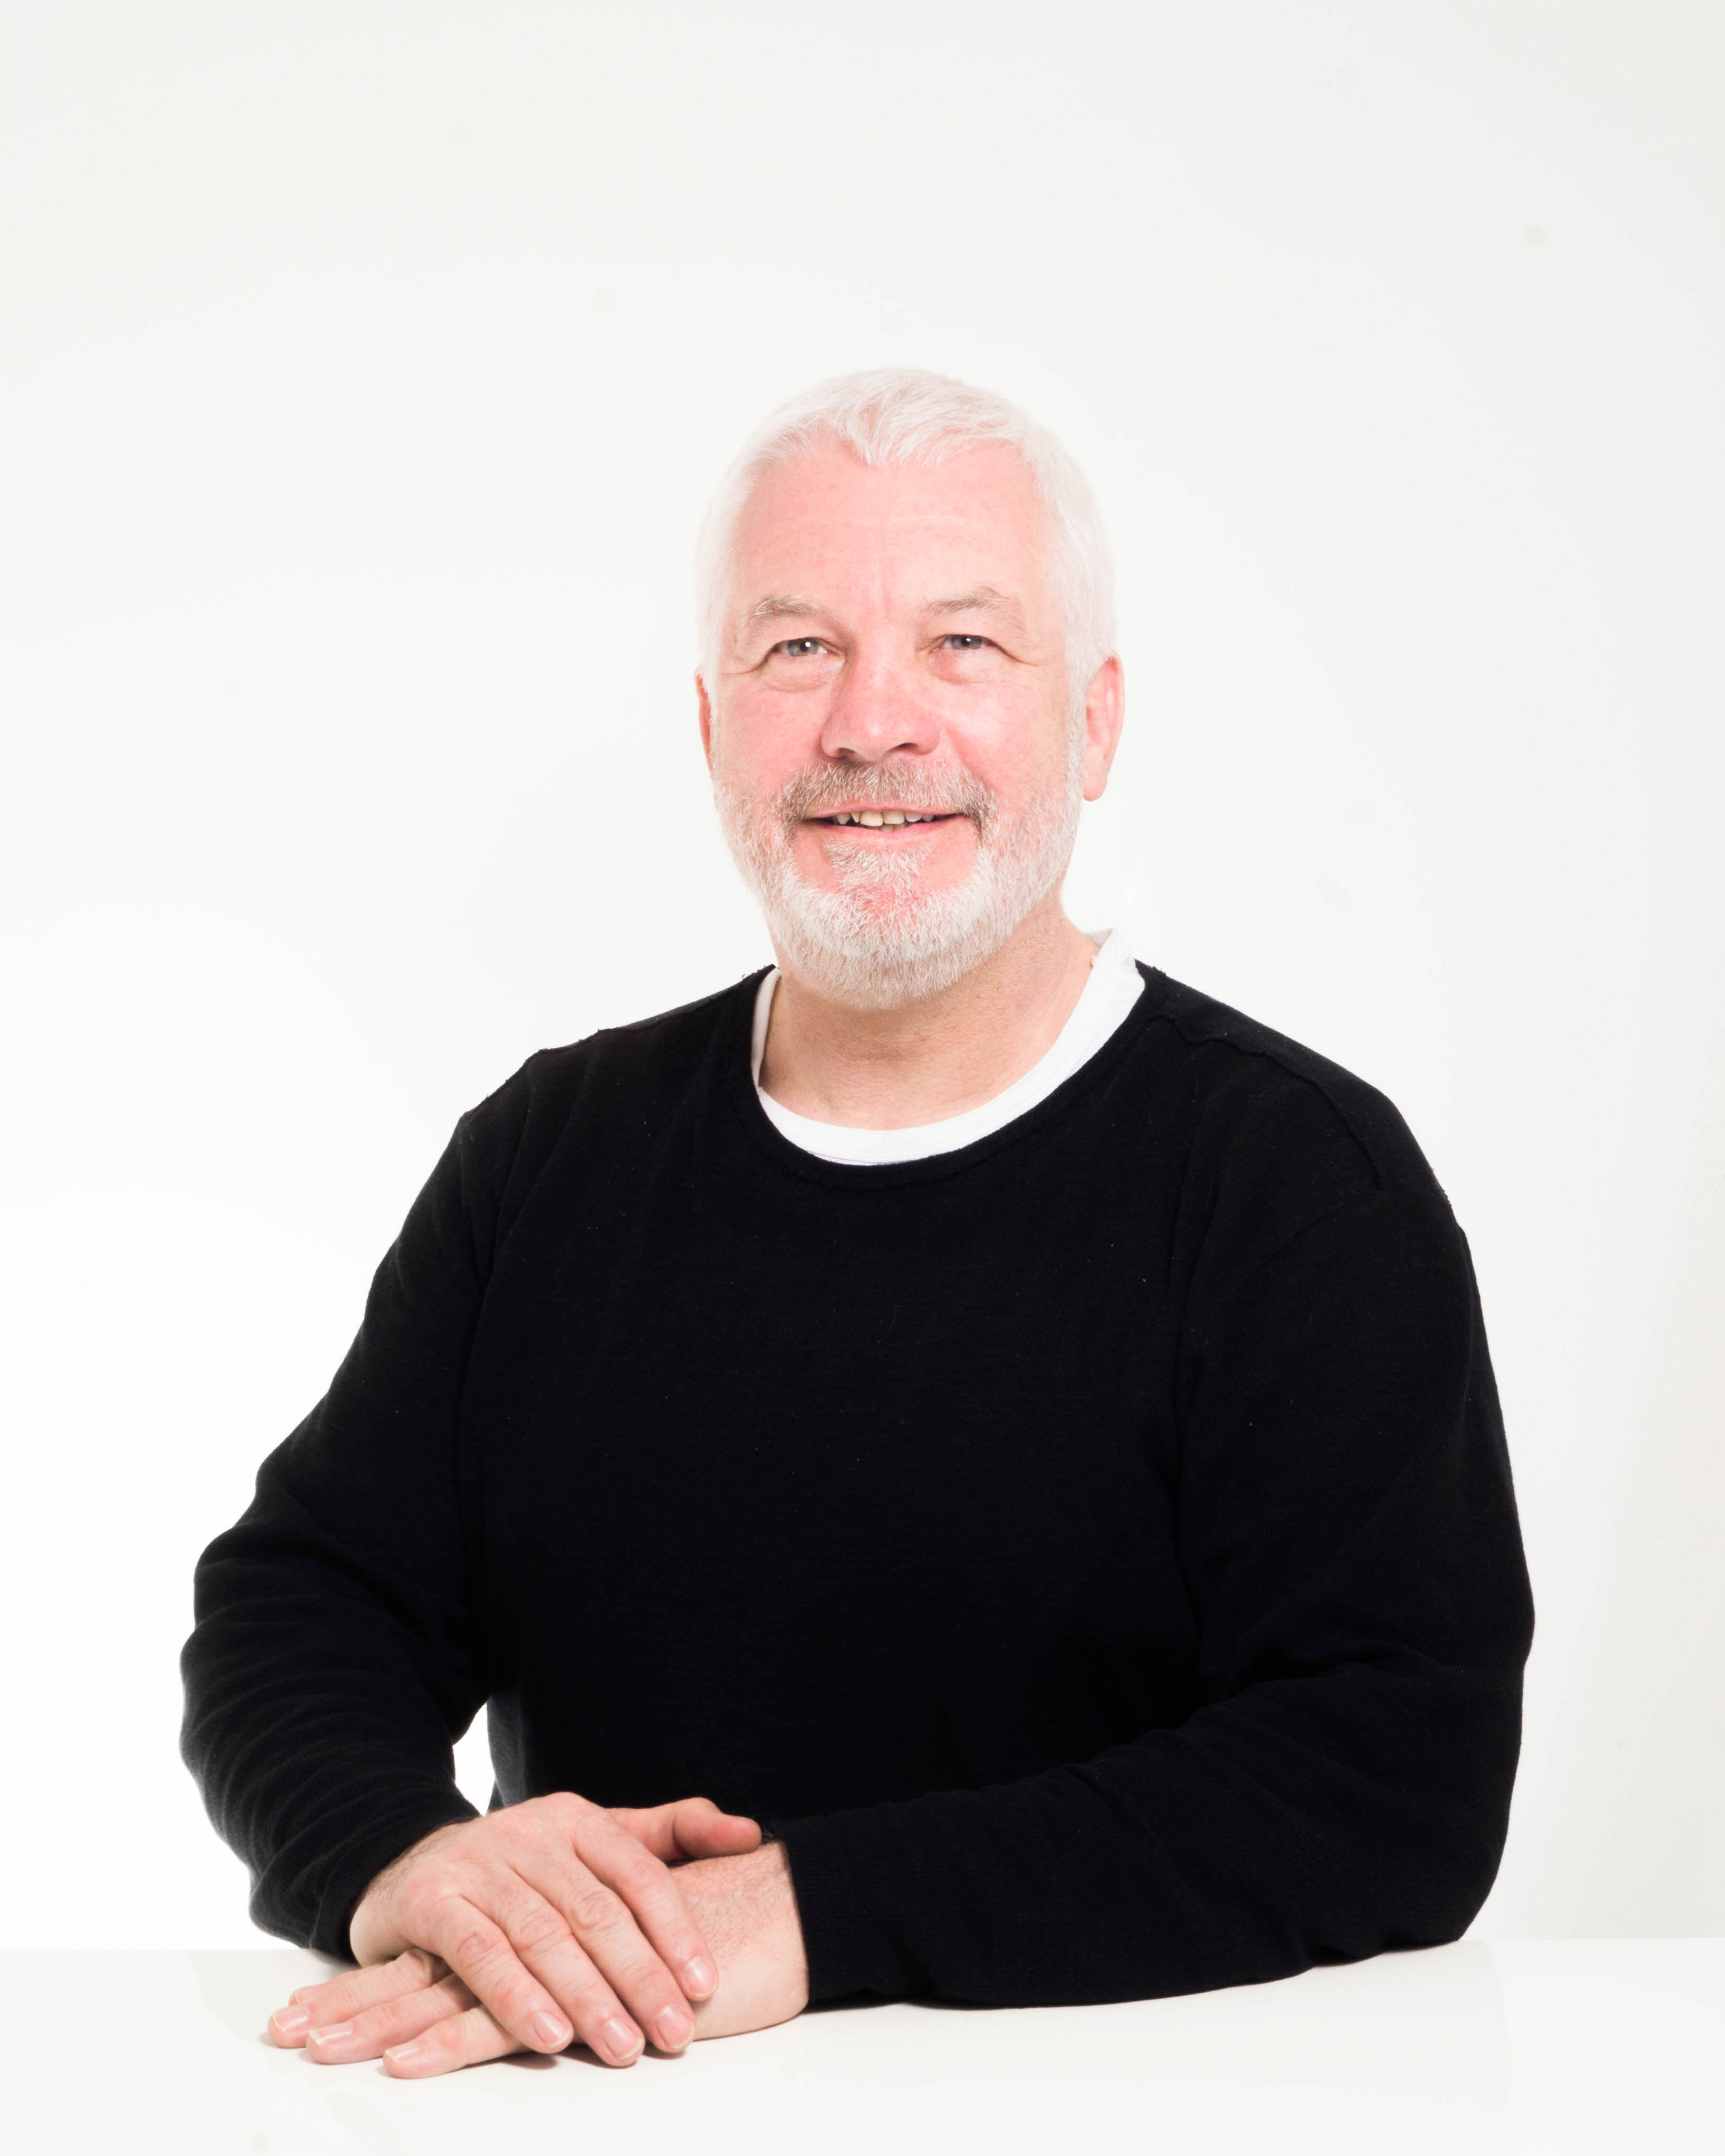 FlowForma - Robert McGarry, CCO and Business Process Software Expert